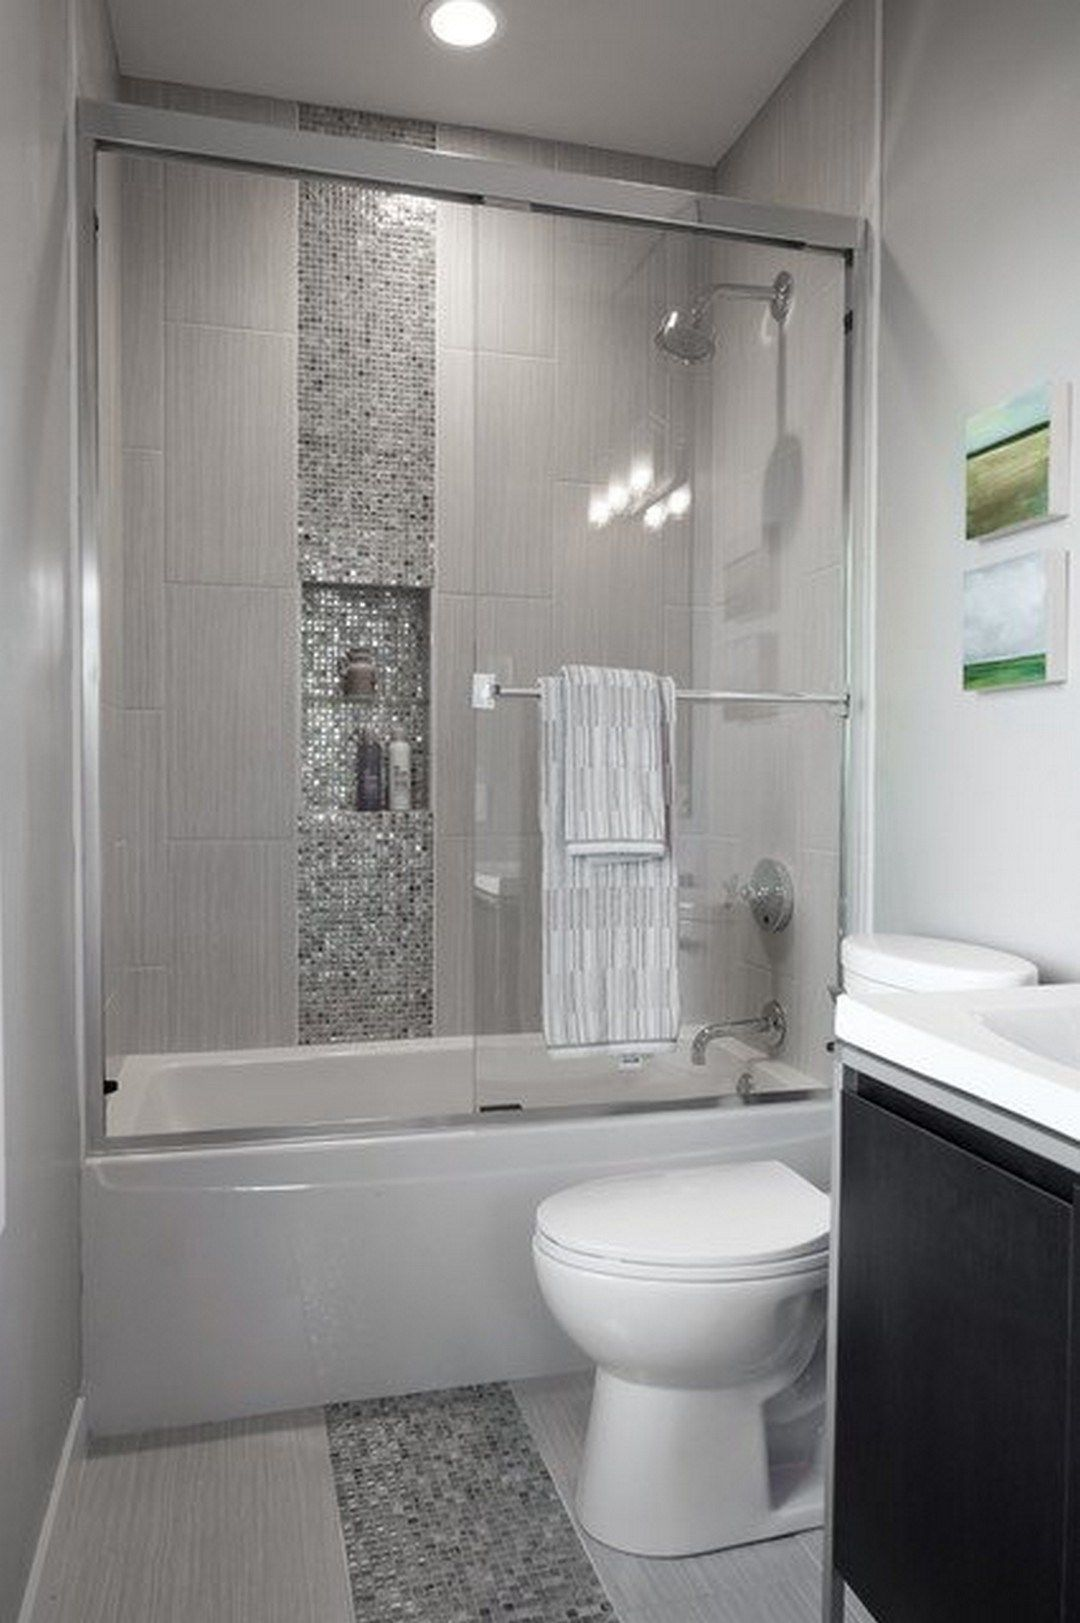 Tile Design Bathroom Simple 99 New Trends Bathroom Tile Design Inspiration 2017 26  Tile Inspiration